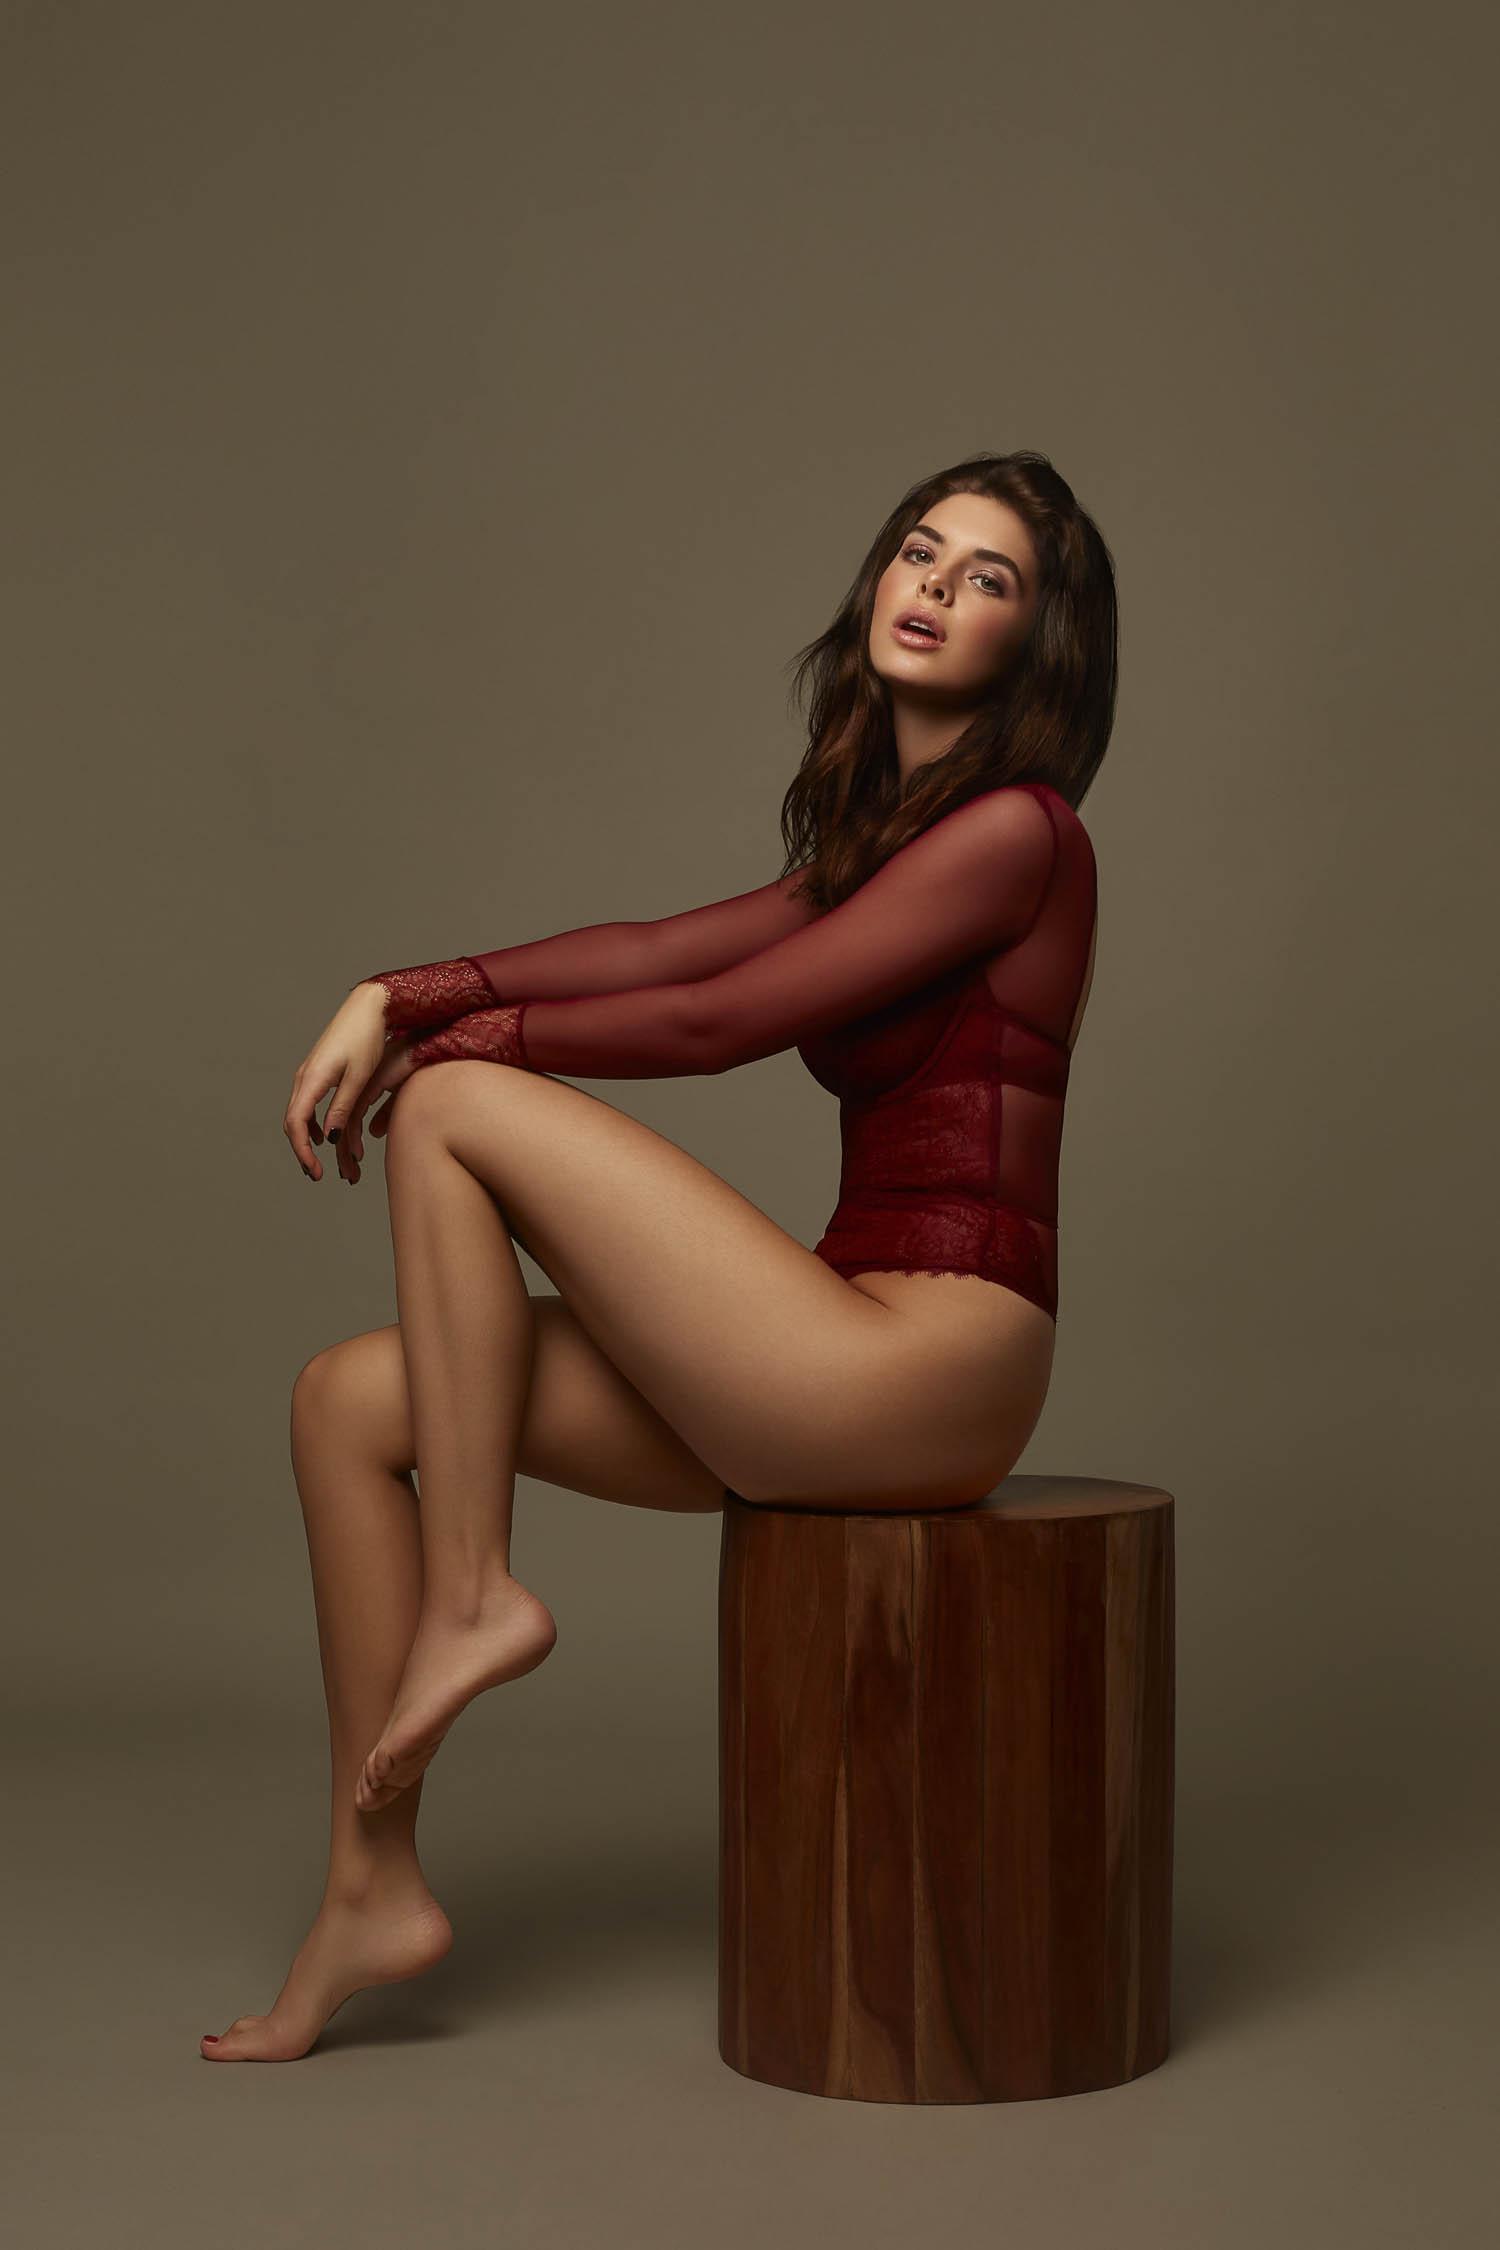 Brunette wearing burgundy long sleeve bodysuit sitting on a wooden stool